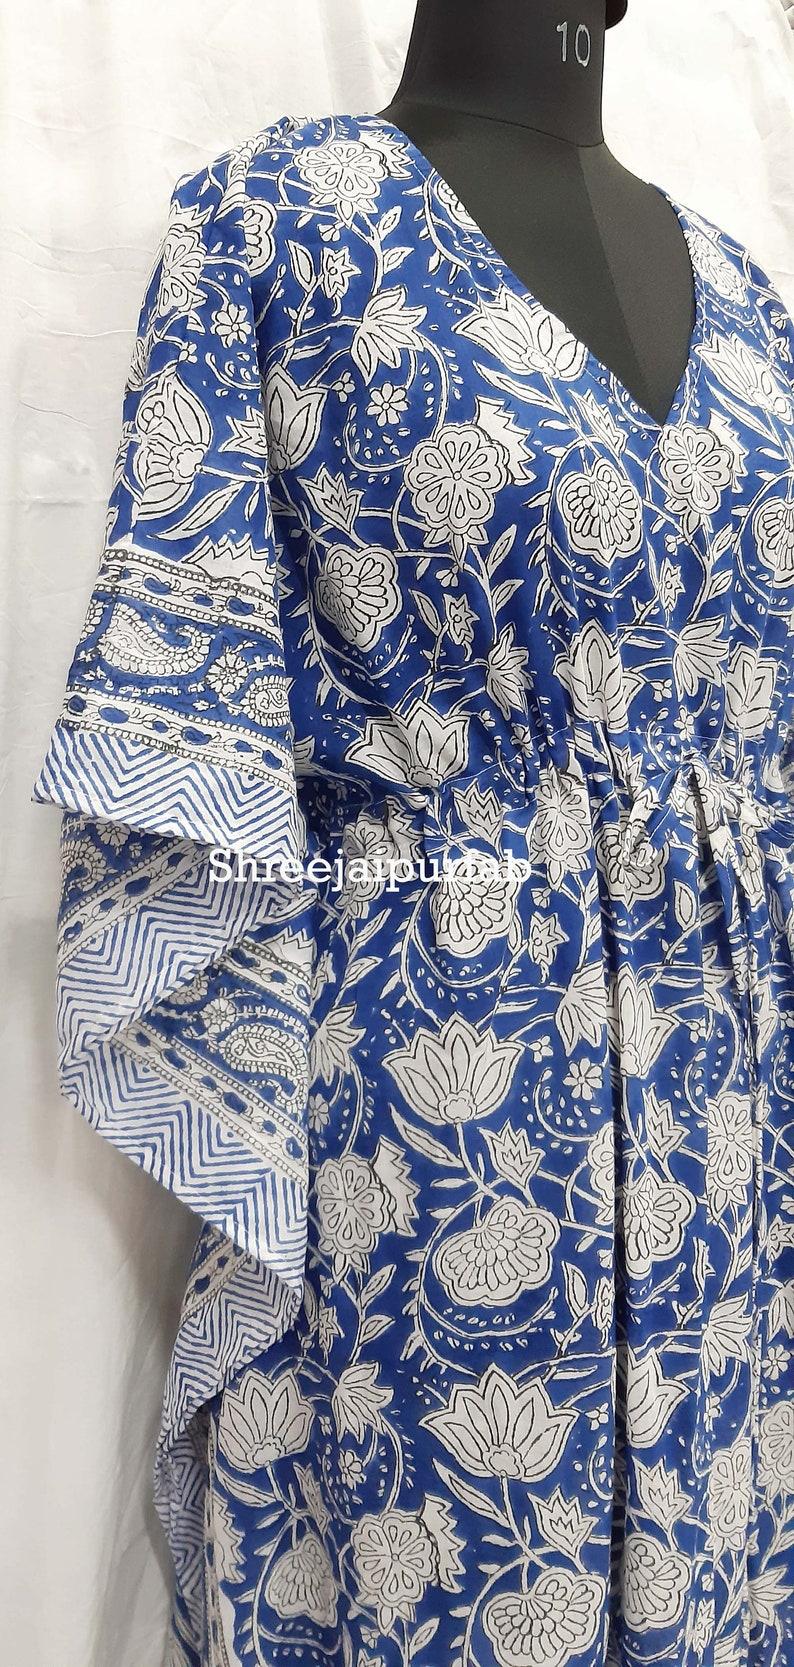 Shreejaipurfab Indian Hand Block Print Girls Caftan  Dress 100/% cotton  Fabric,Beautiful Floral Design,Made for girls,Spring Summer Dress